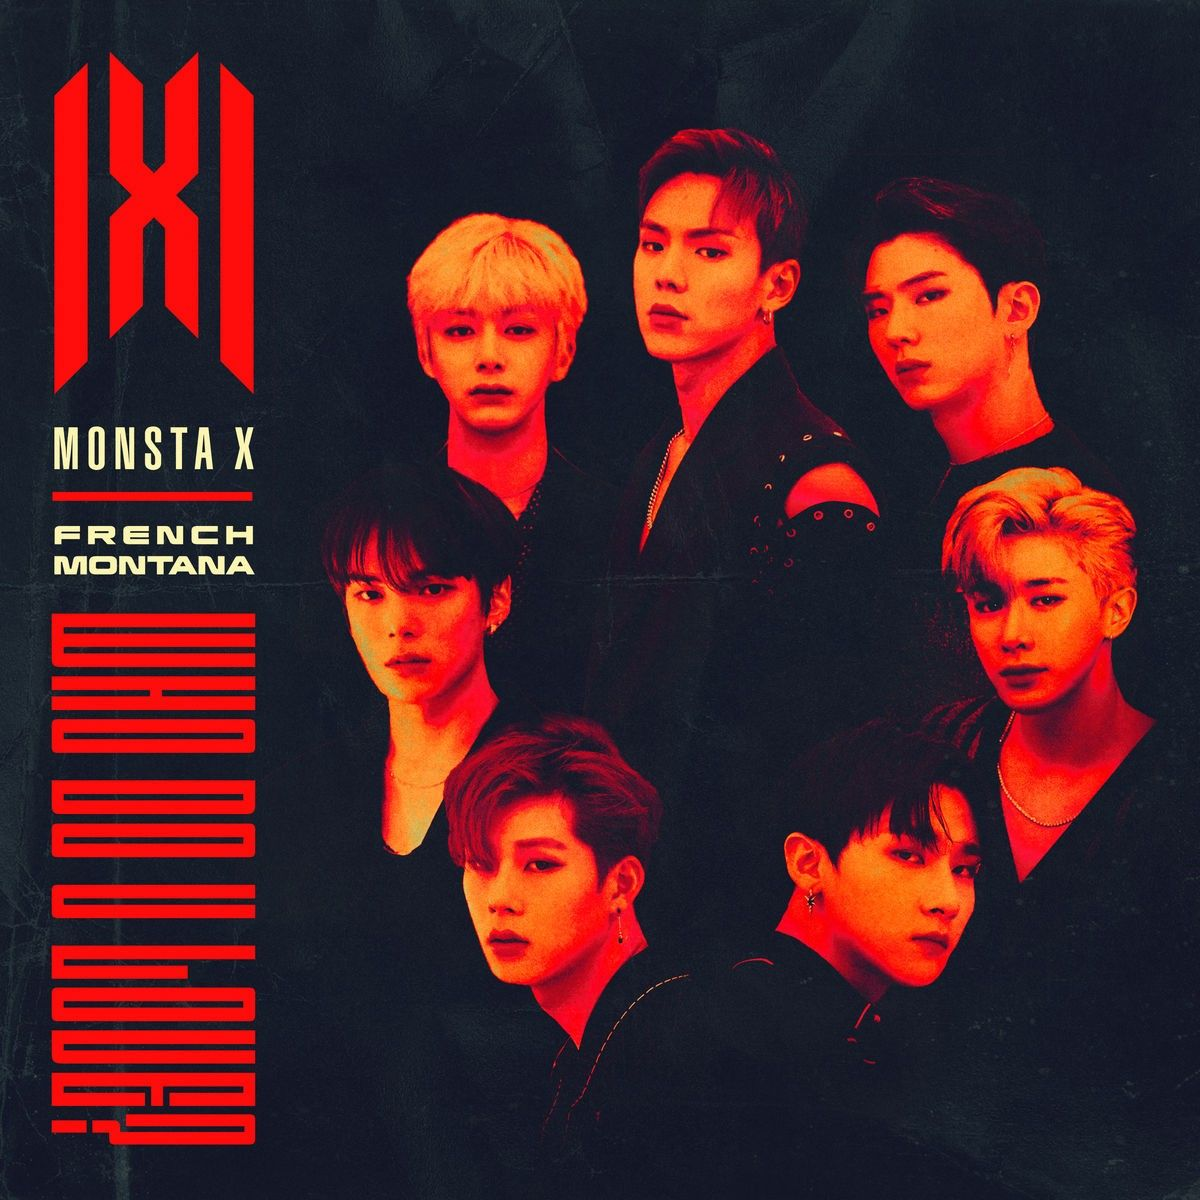 Monsta X Who Do You Love French Montana Album French Montana